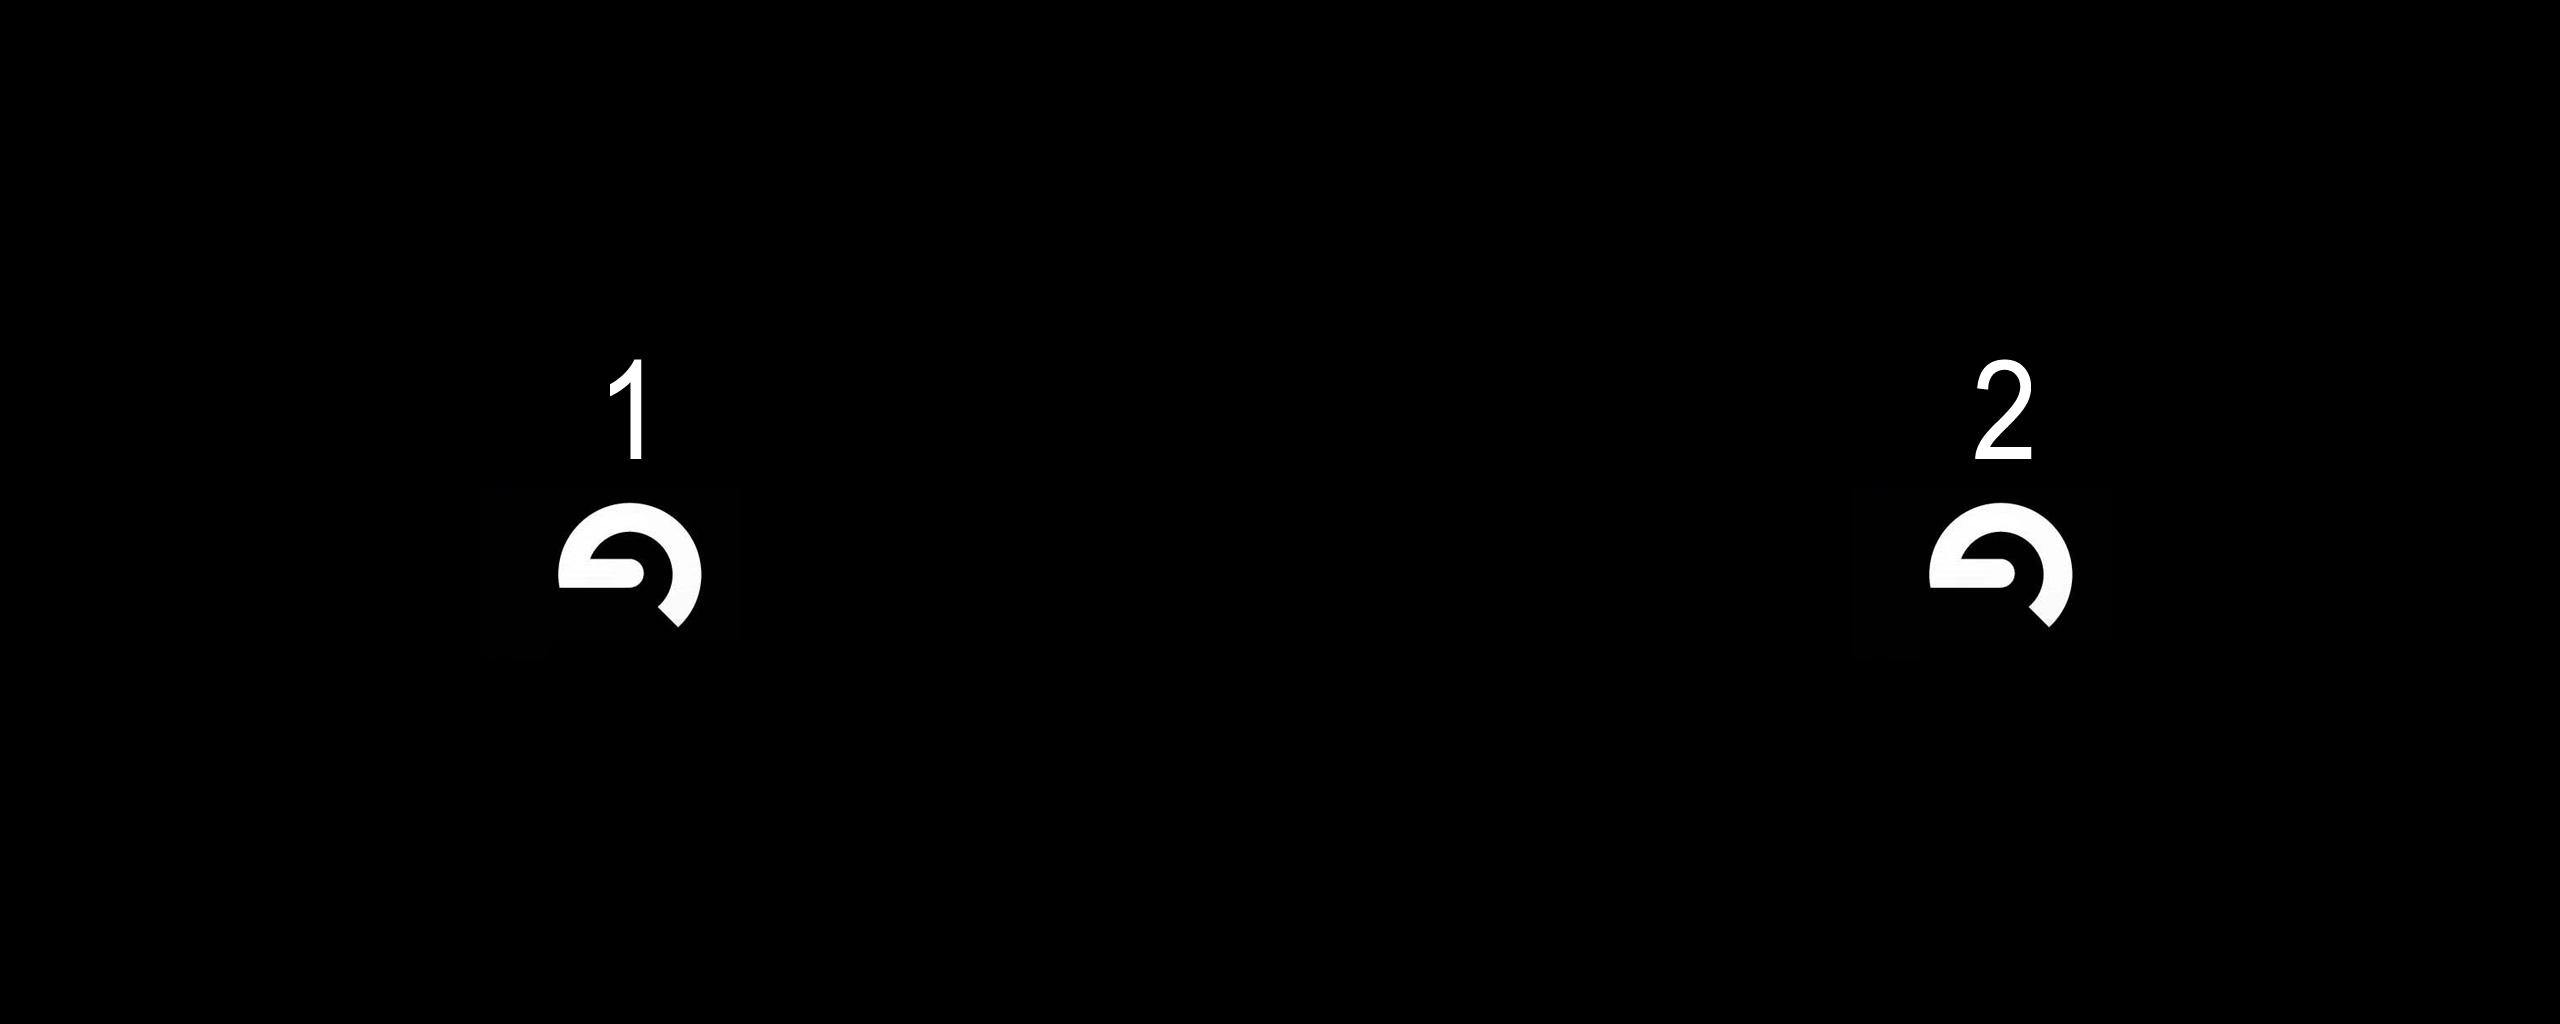 Ableton Producer 2560x1024 Dual Screen Monitor Wallpaper Original 2560x1024